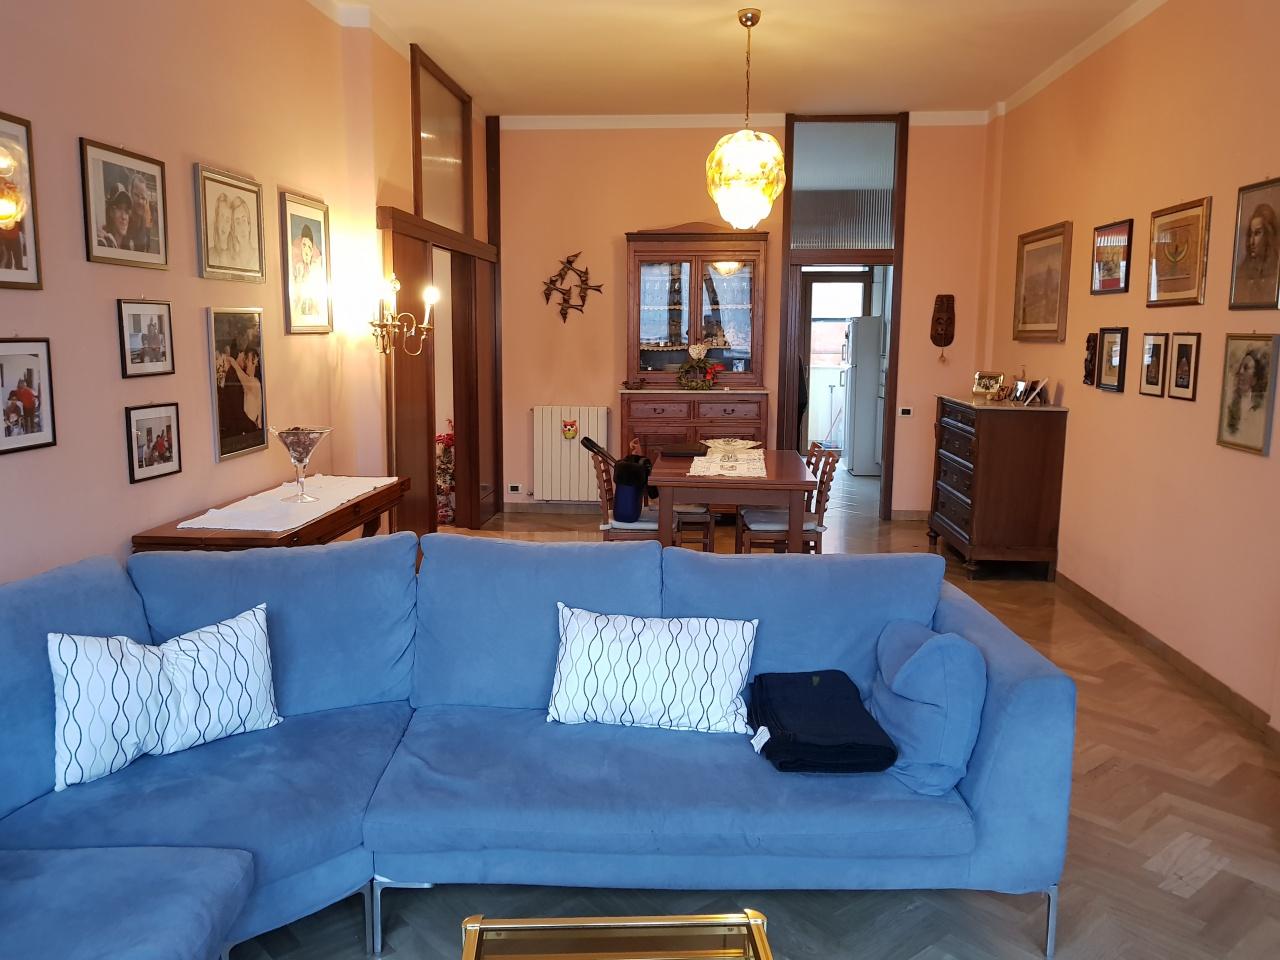 Casa Indipendente in ottime condizioni in vendita Rif. 4768234